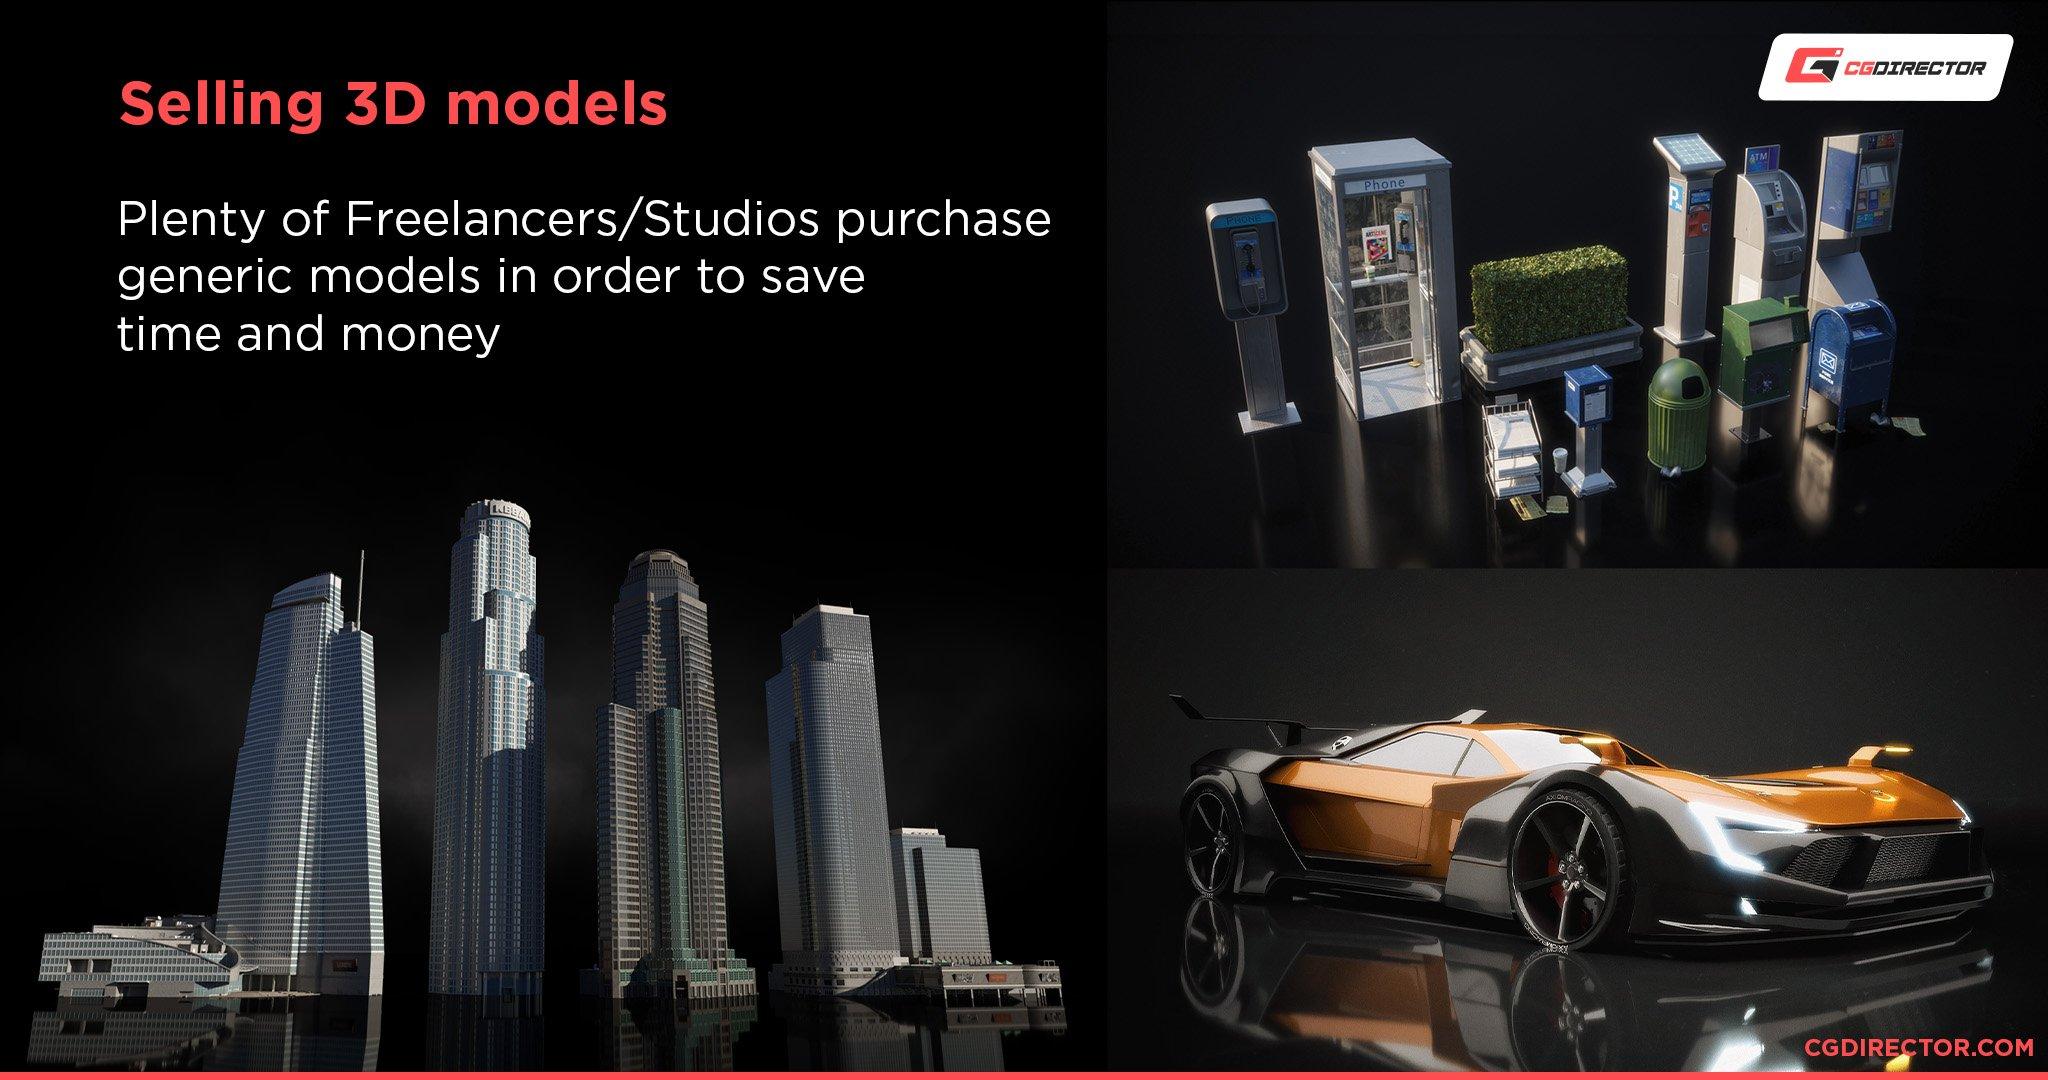 Selling 3D models